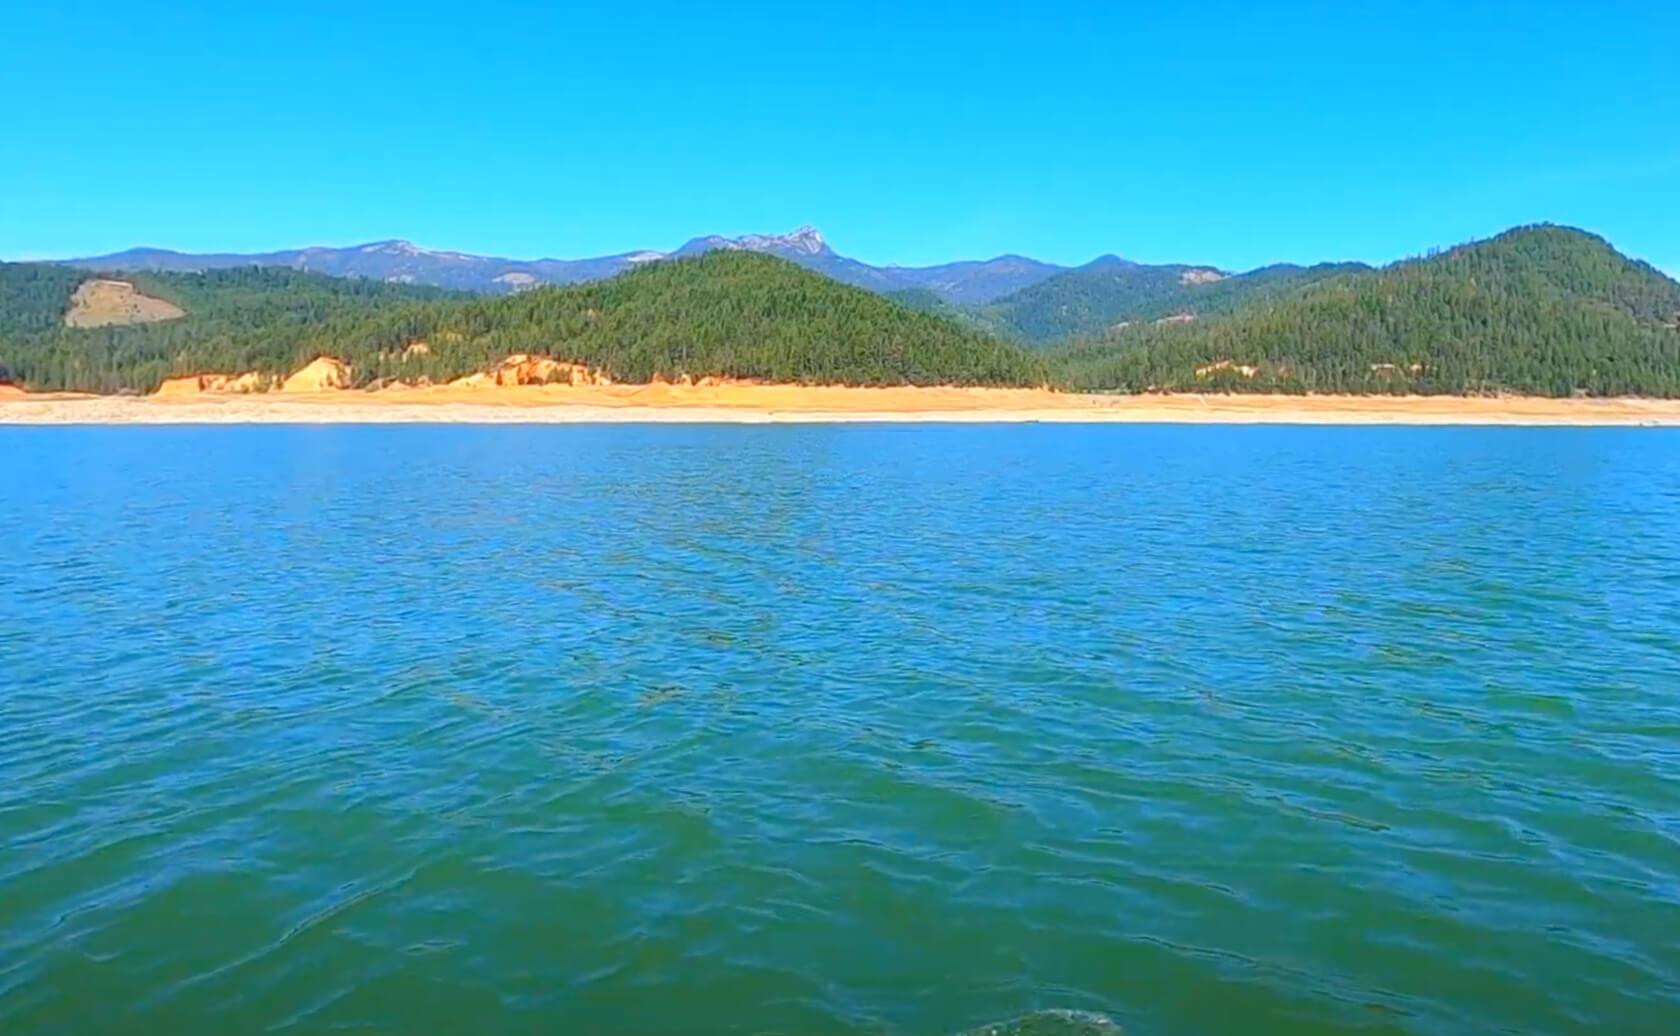 Trinity-Lake-Fishing-Guide-Report-California-05